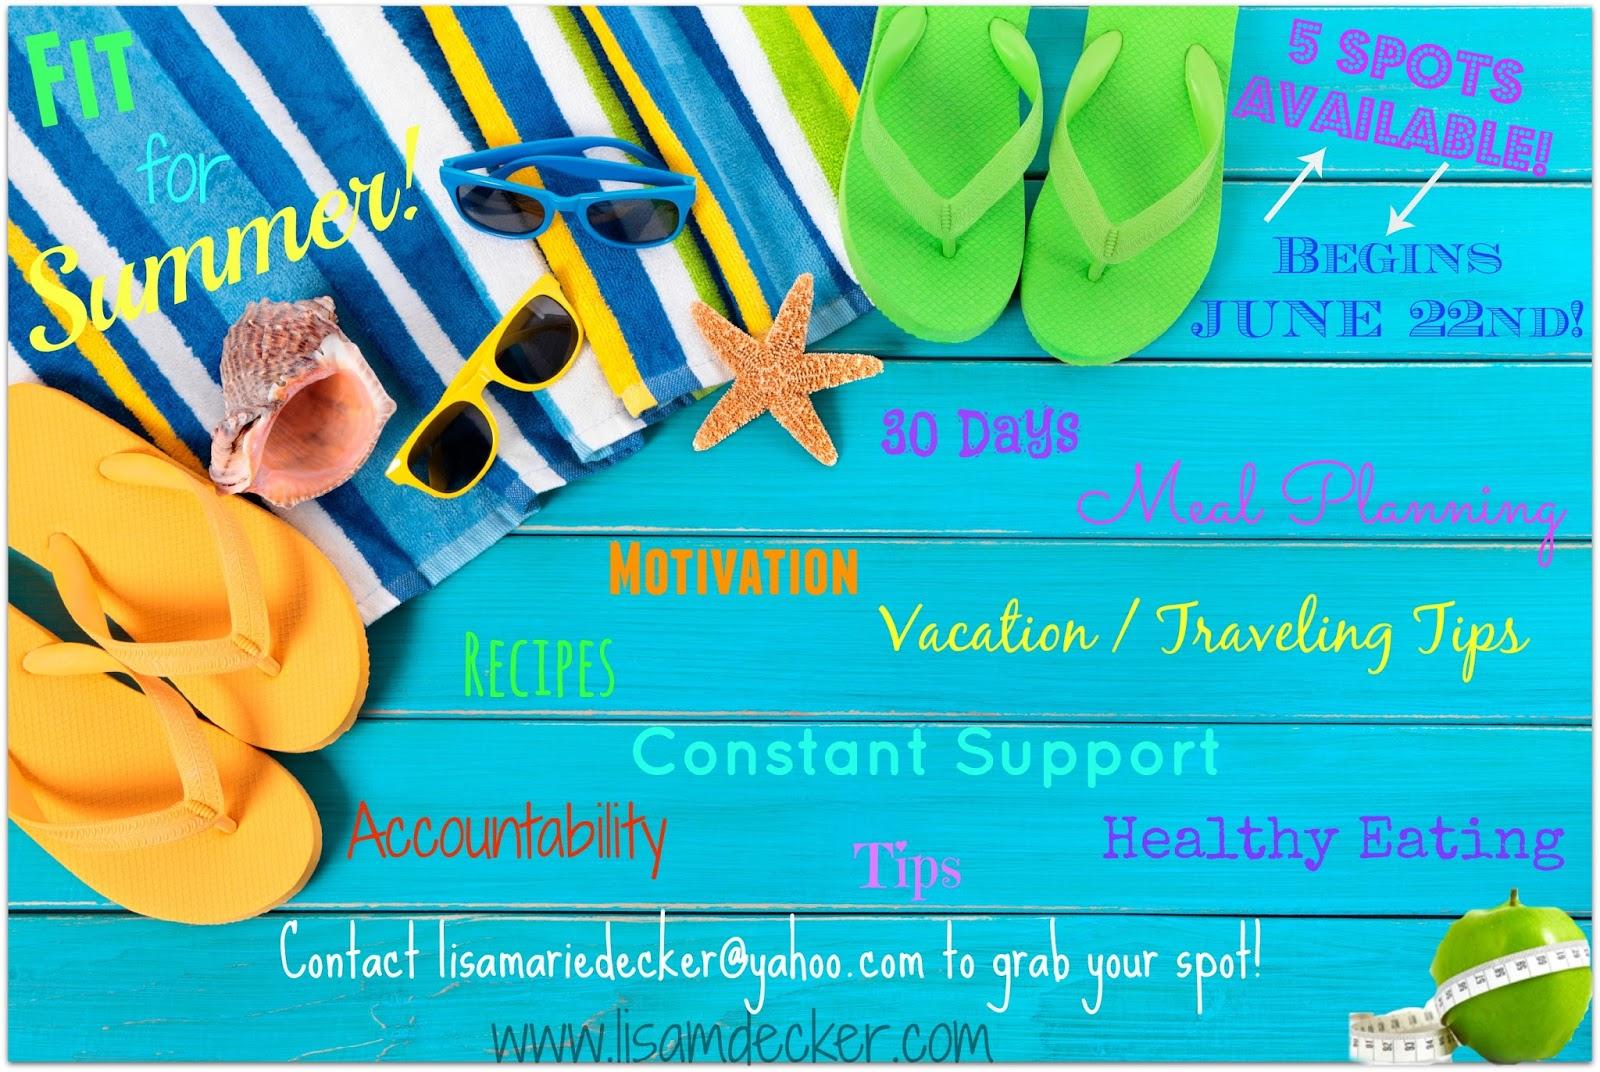 Get Healthy for Summer Challenge